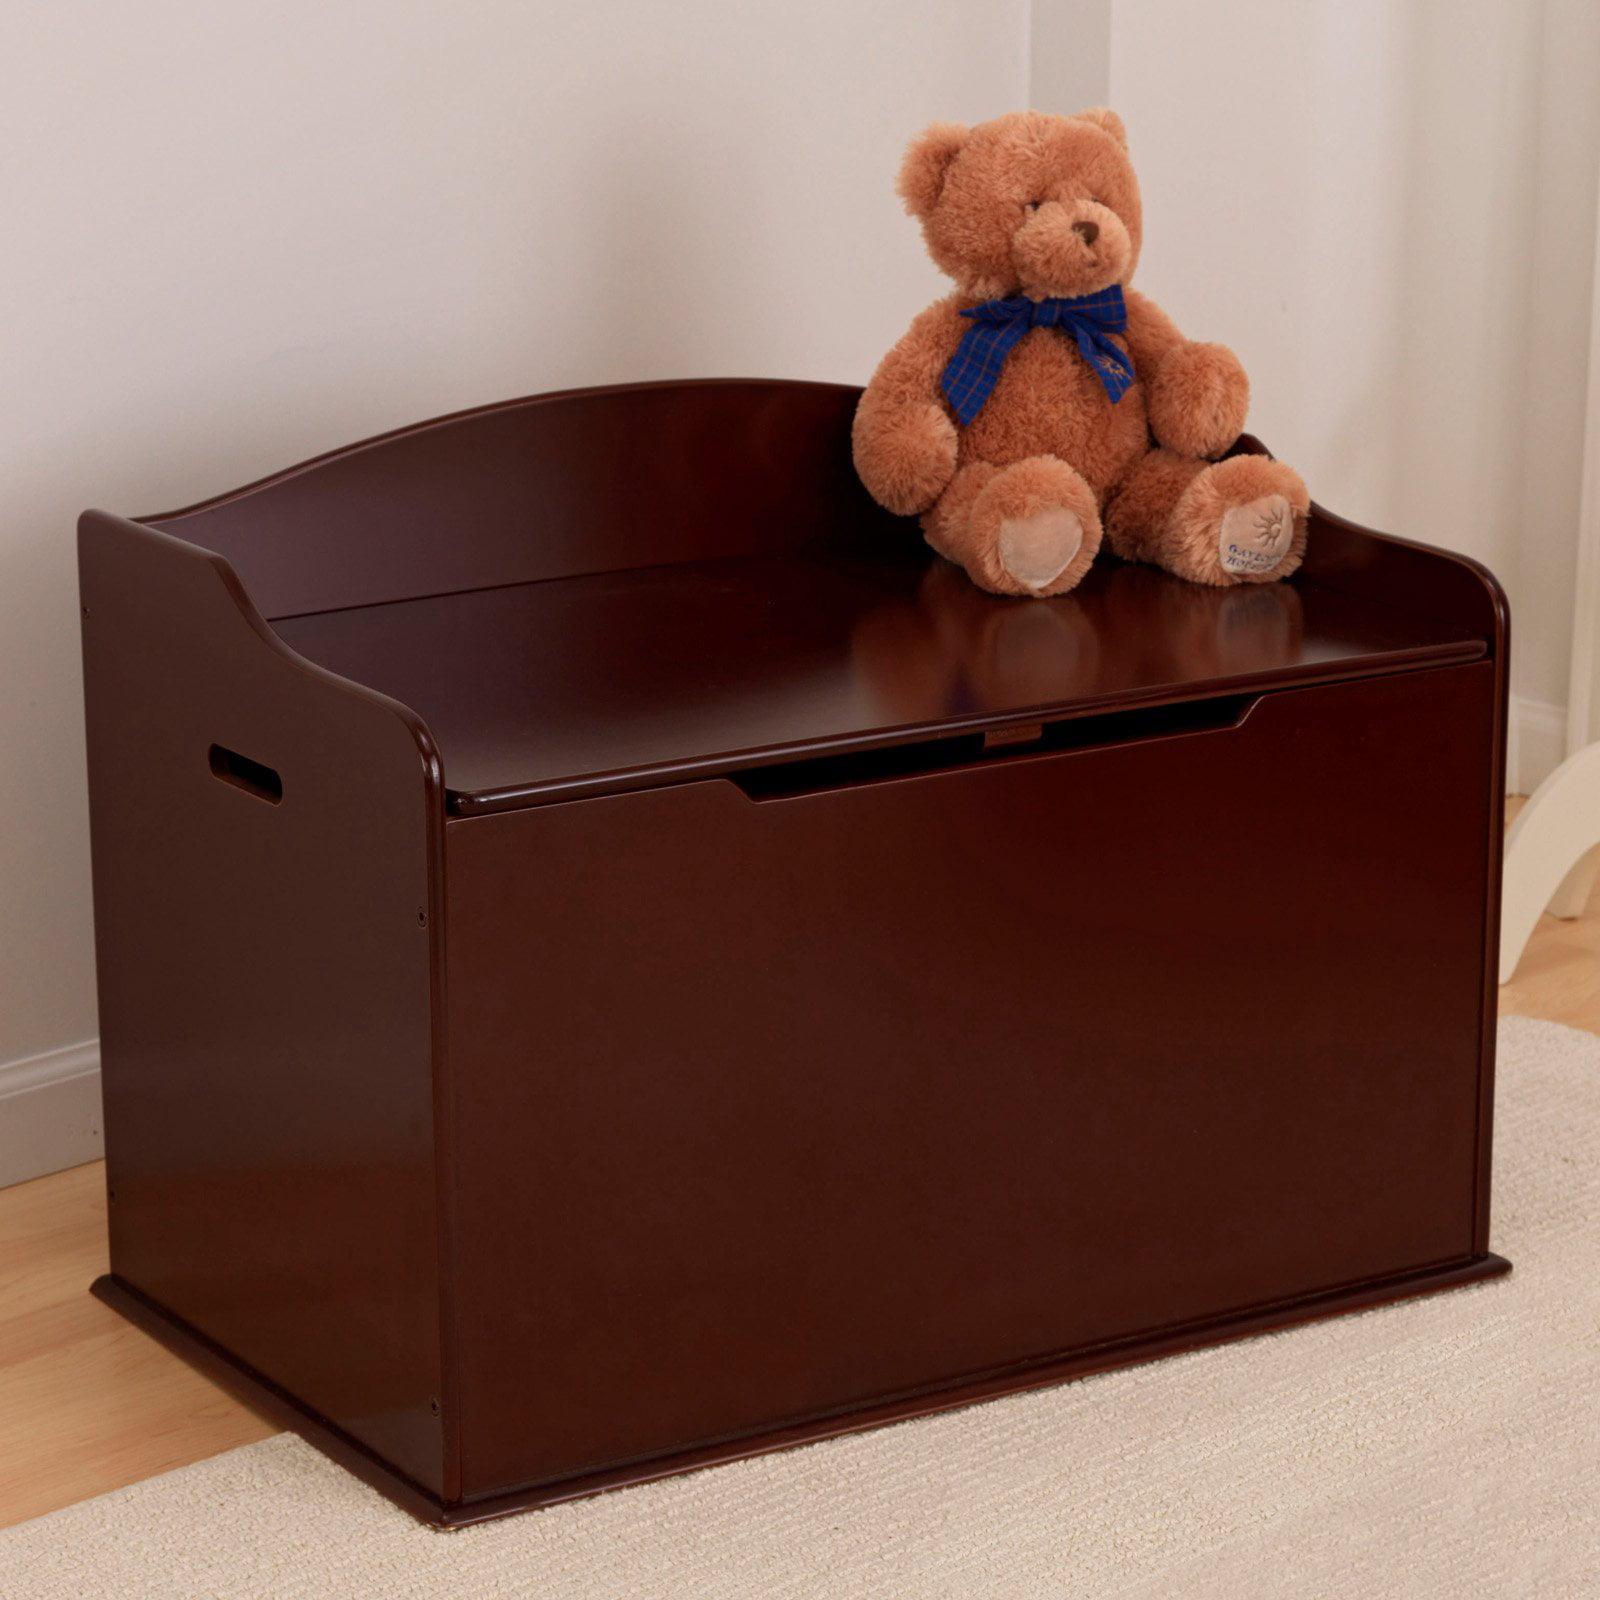 Kidkraft austin toy box natural 14953 - Kidkraft Austin Toy Box Natural 14953 11